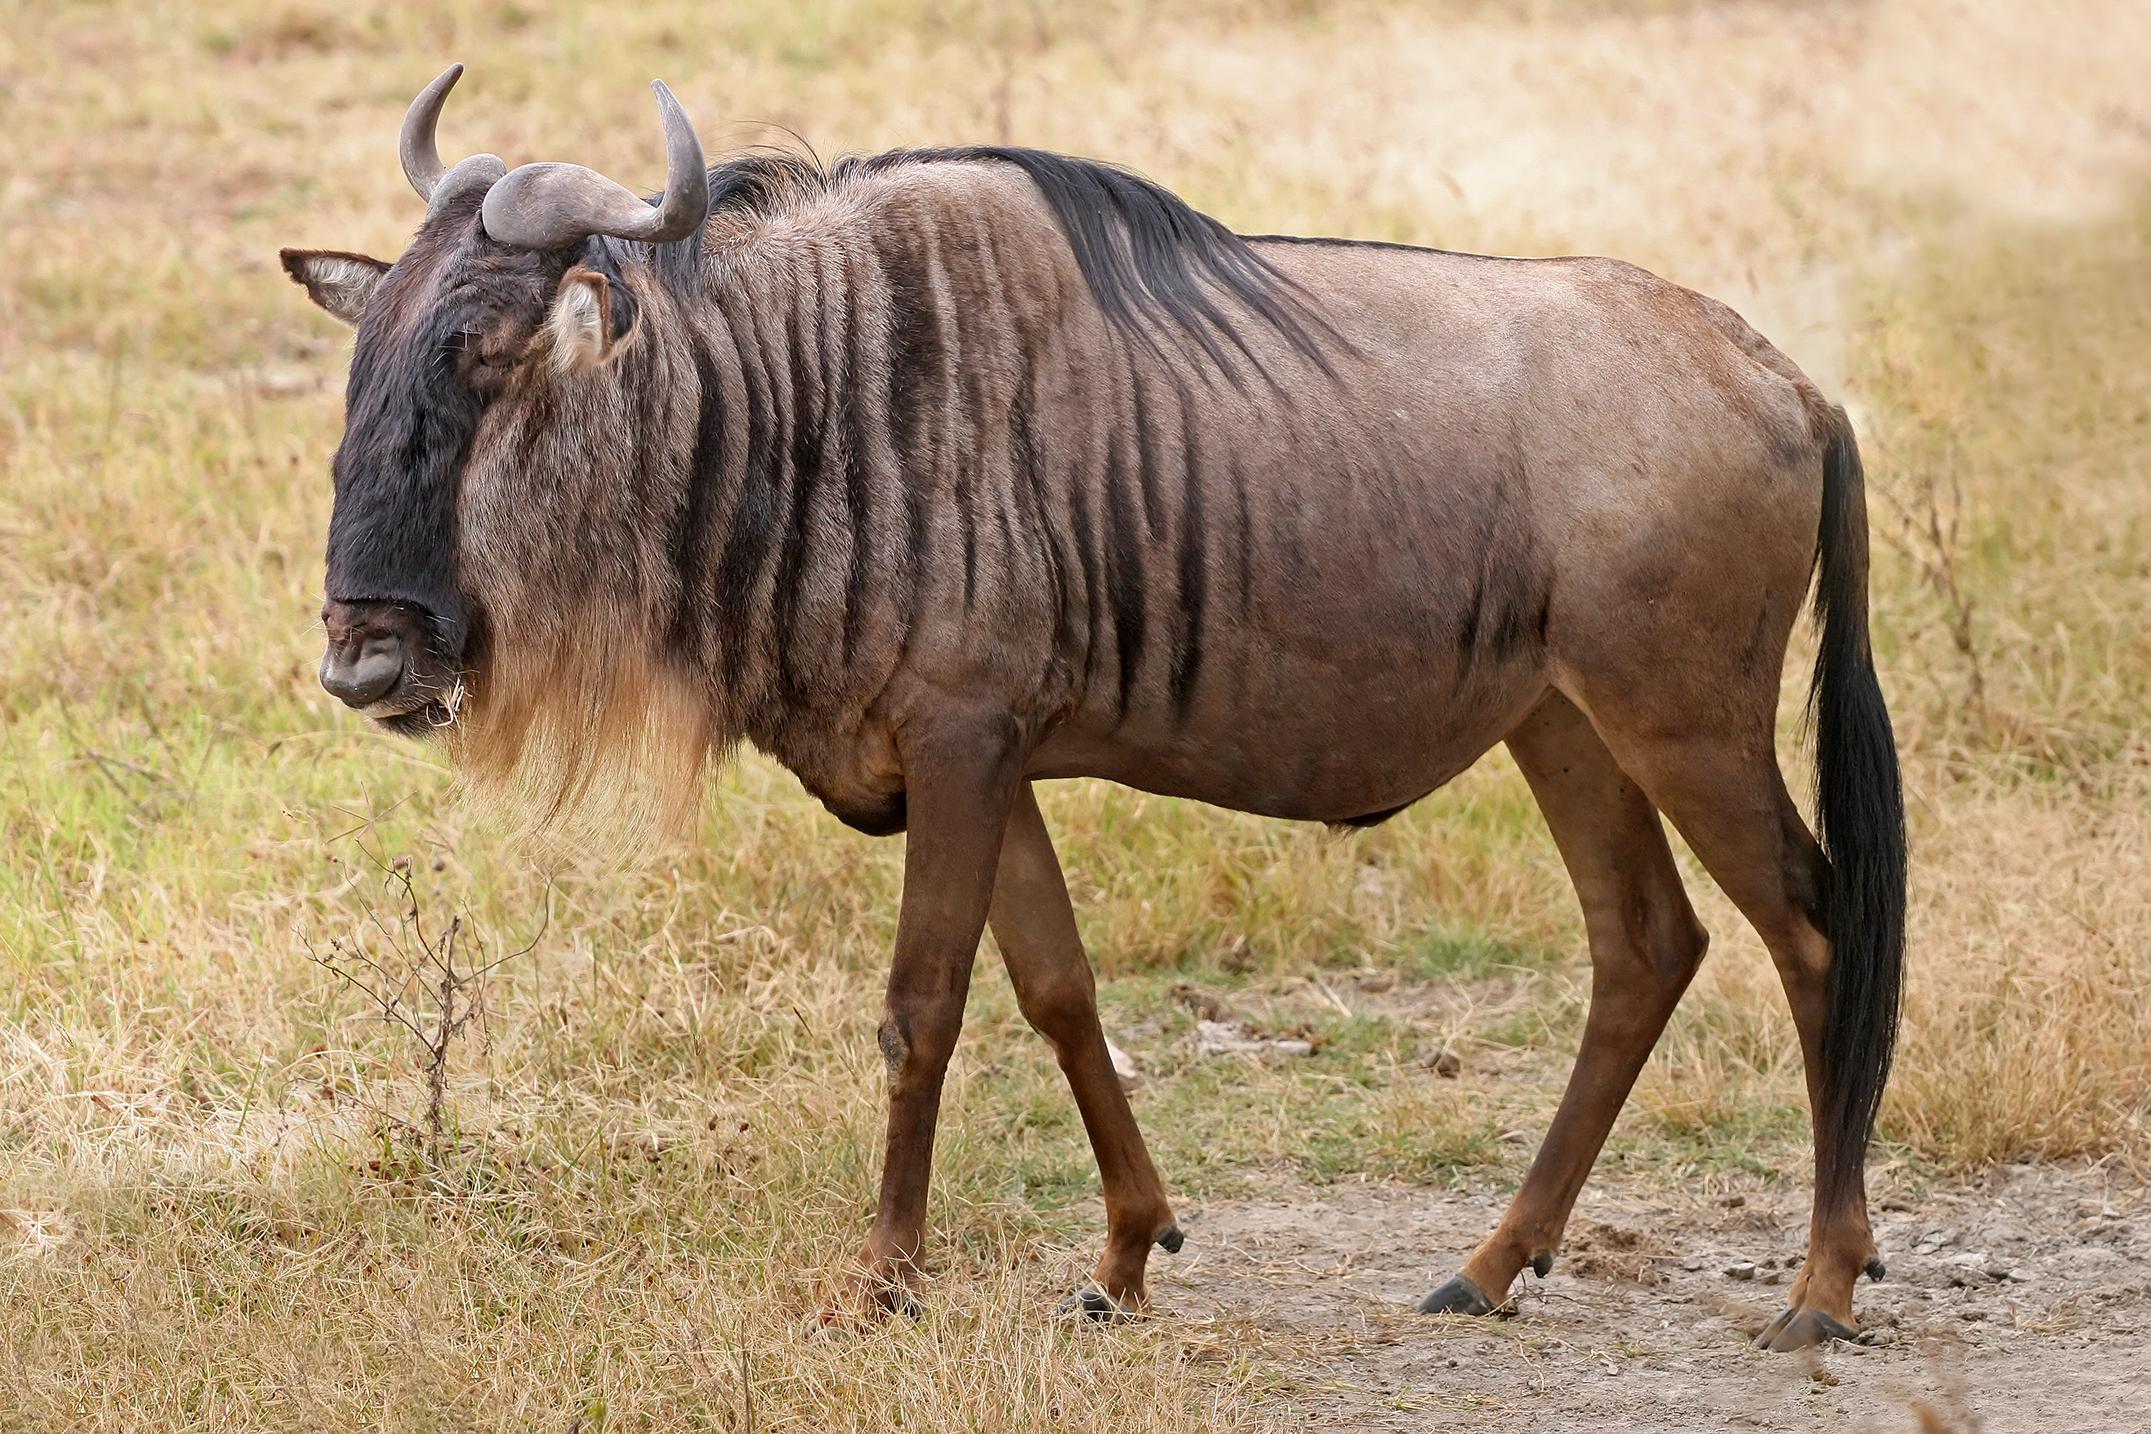 A Blue Wildebeest (Connochaetes taurinus) in the Ngorongoro Crater, Tanzania. Photo taken on June 16, 2010.